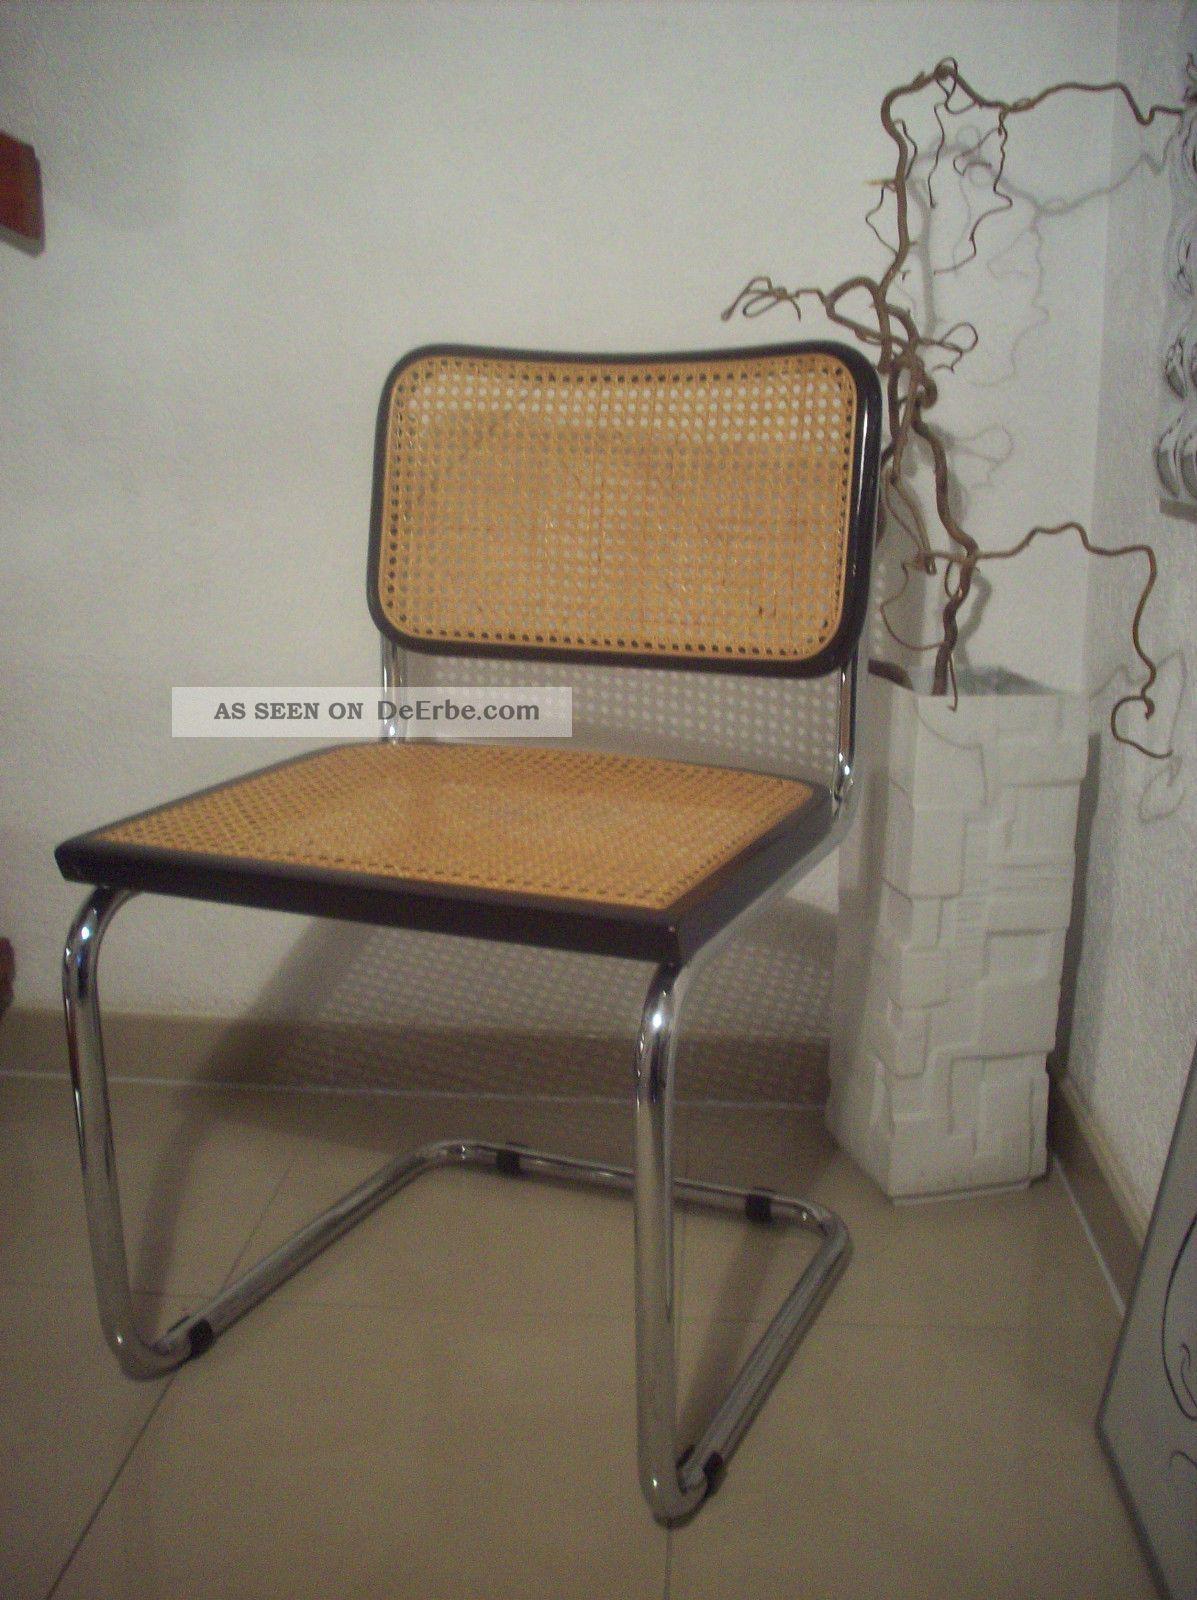 marcel breuer freischwinger marcel breuer freischwinger. Black Bedroom Furniture Sets. Home Design Ideas